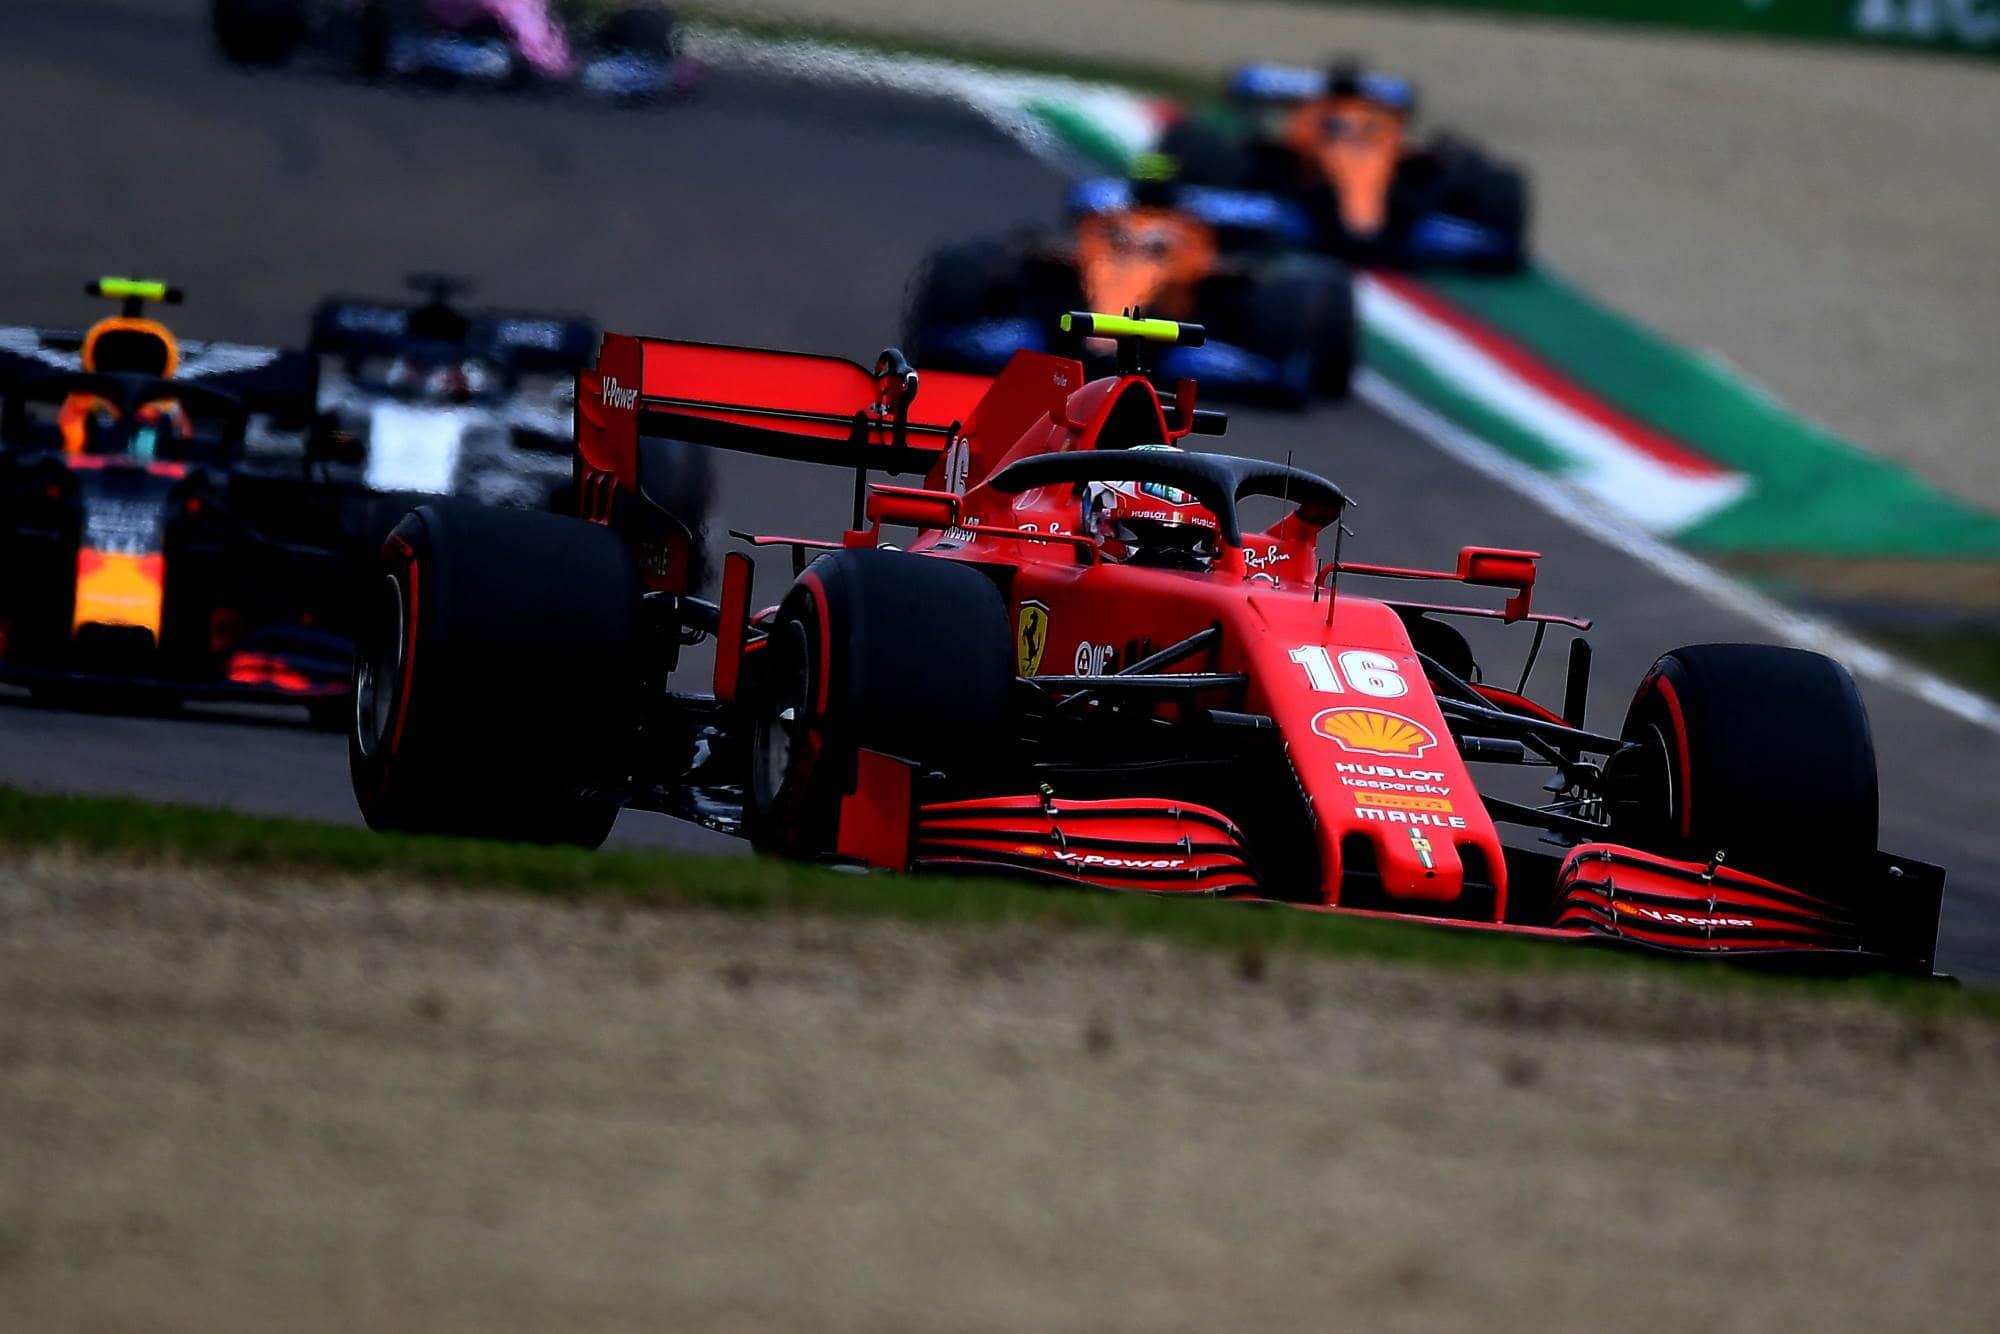 2020 Emilia Romagna Imola Ferrari SF1000 Leclerc leads Albon Red Bull Photo Ferrari